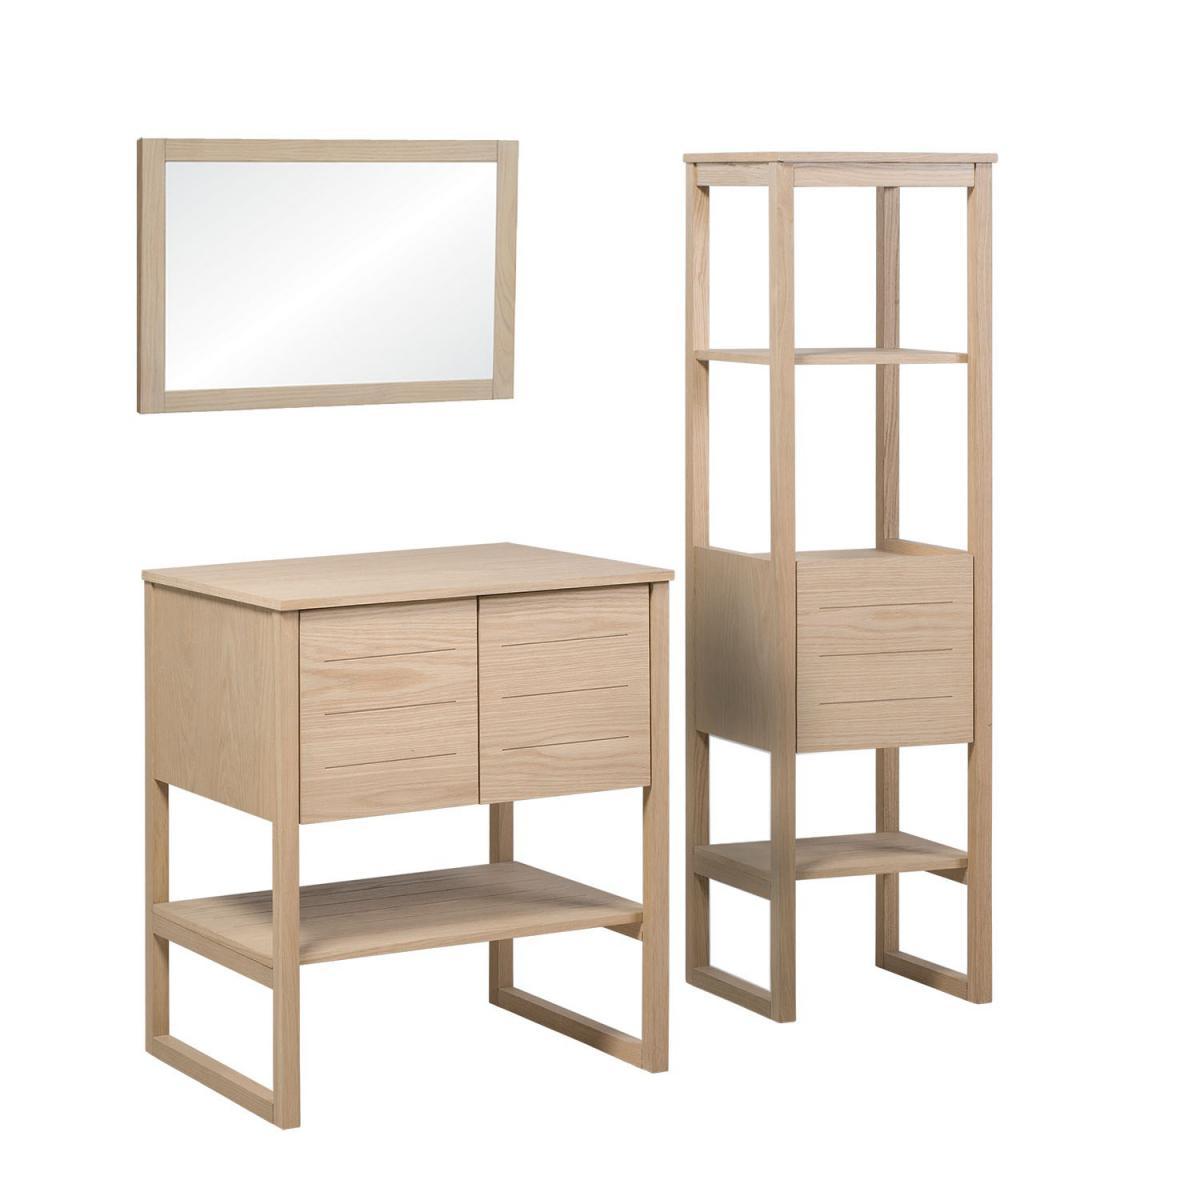 Mob-In Meuble de Salle De Bain Chêne 70 cm + Colonne de rangement Chêne 145 cm ATOLL + Miroir